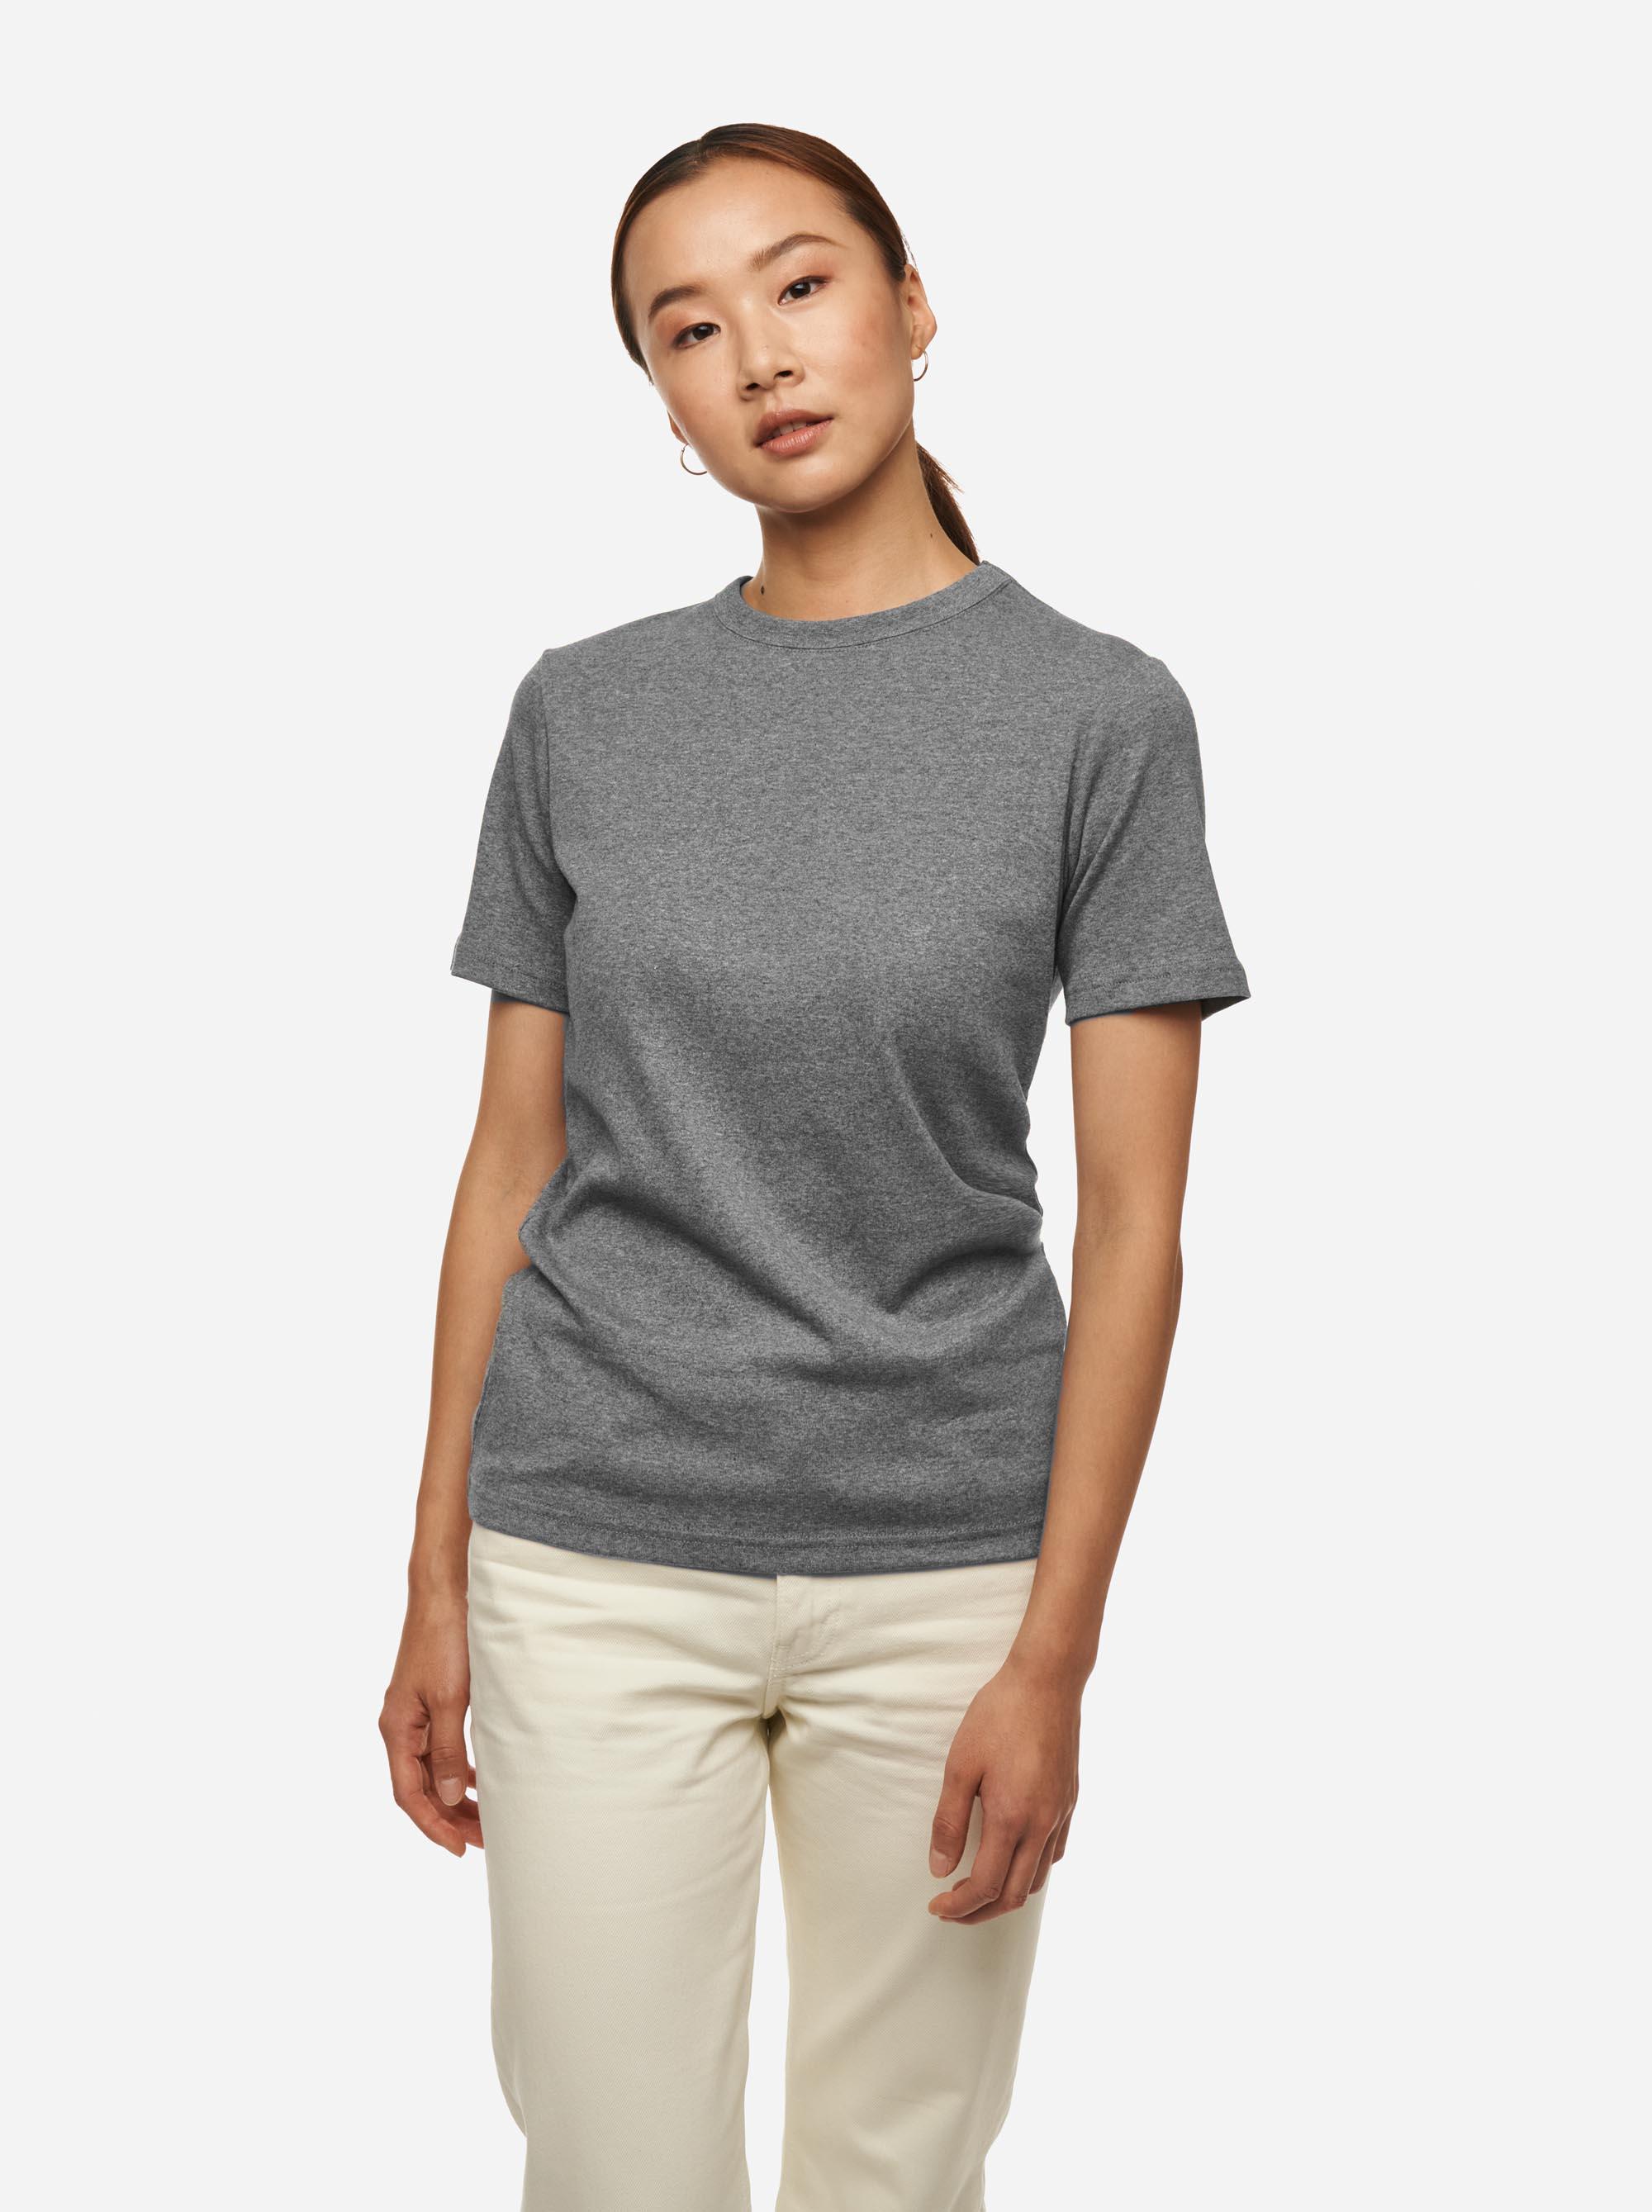 Teym - The T-Shirt - Women - Melange grey - 1B